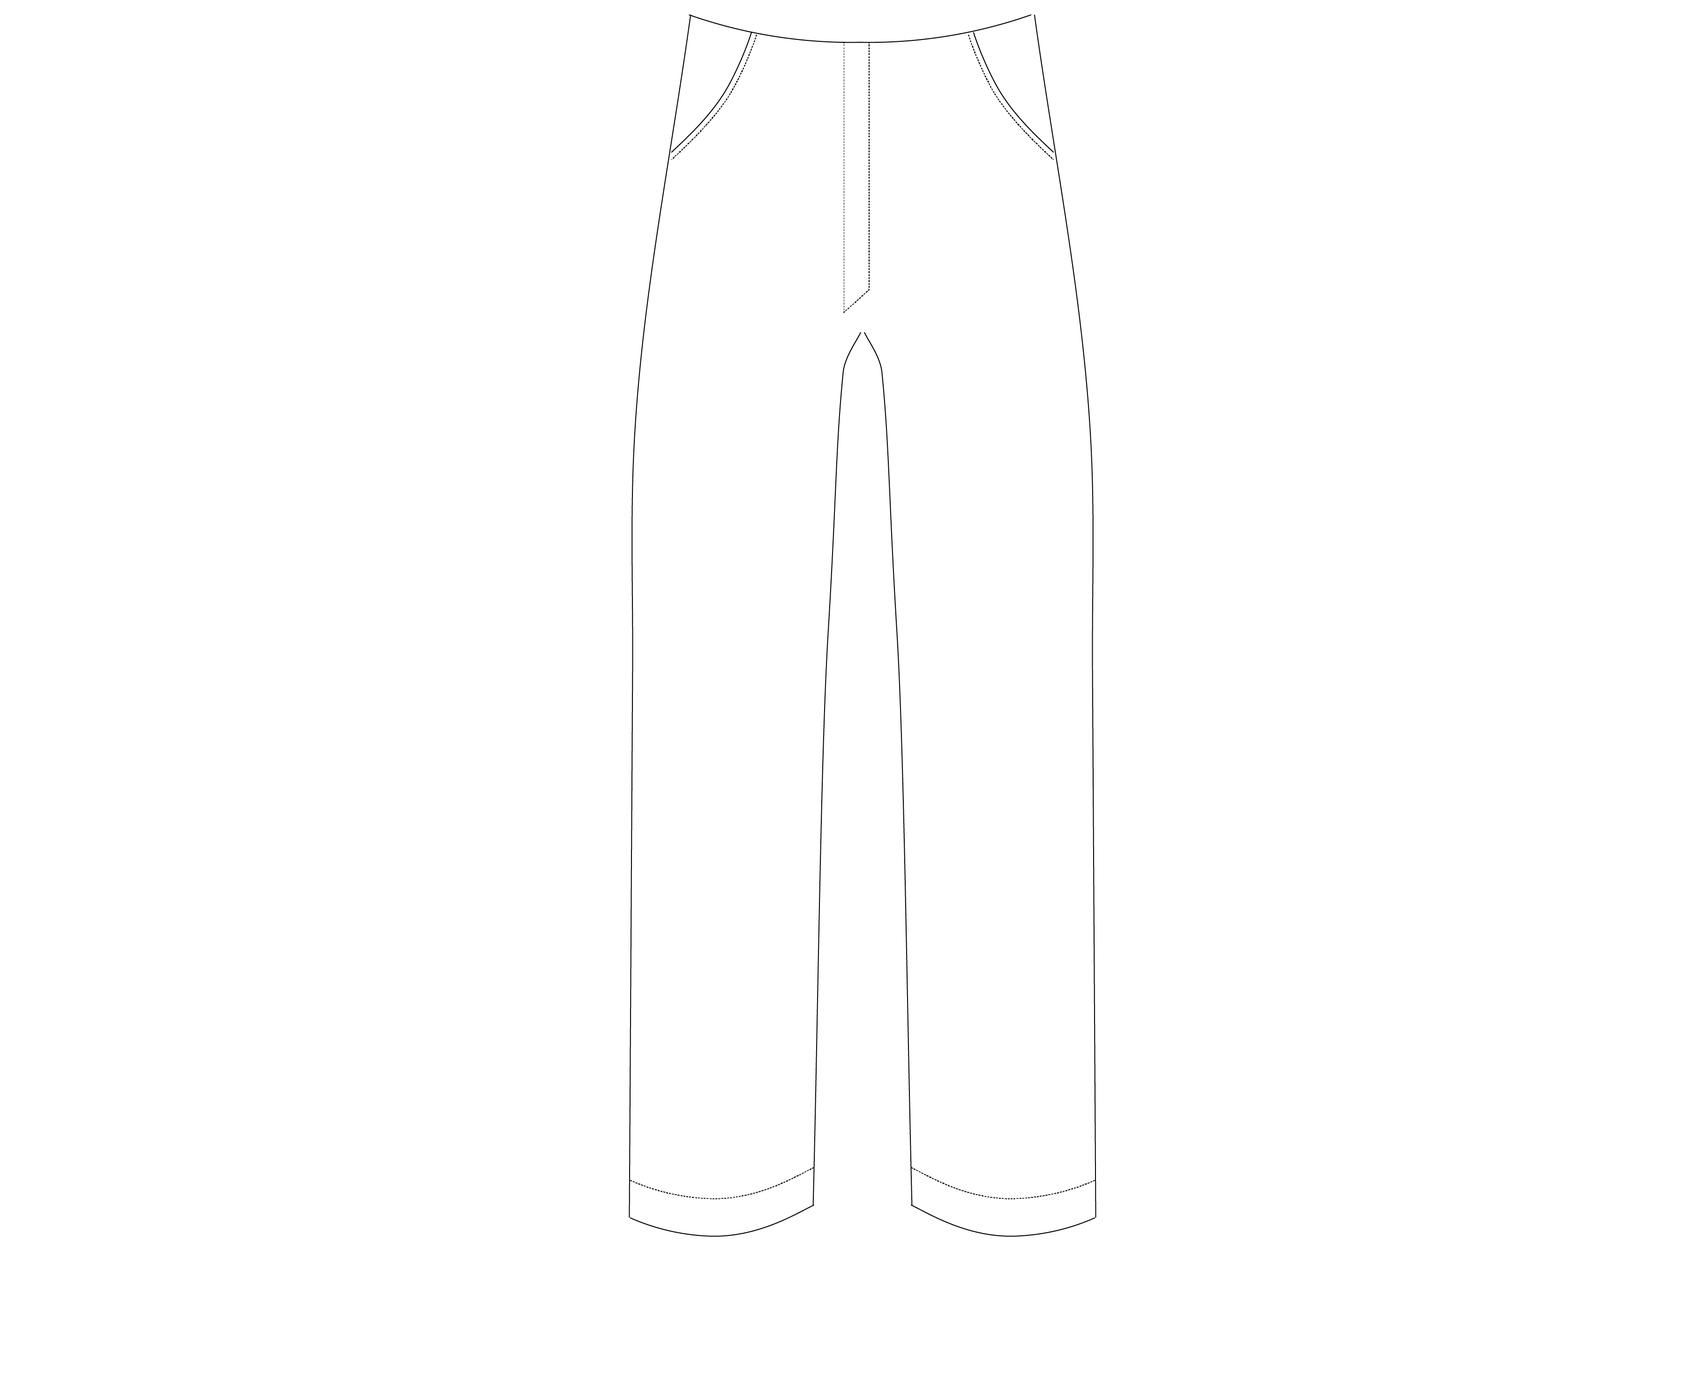 UNC design templates-03.png